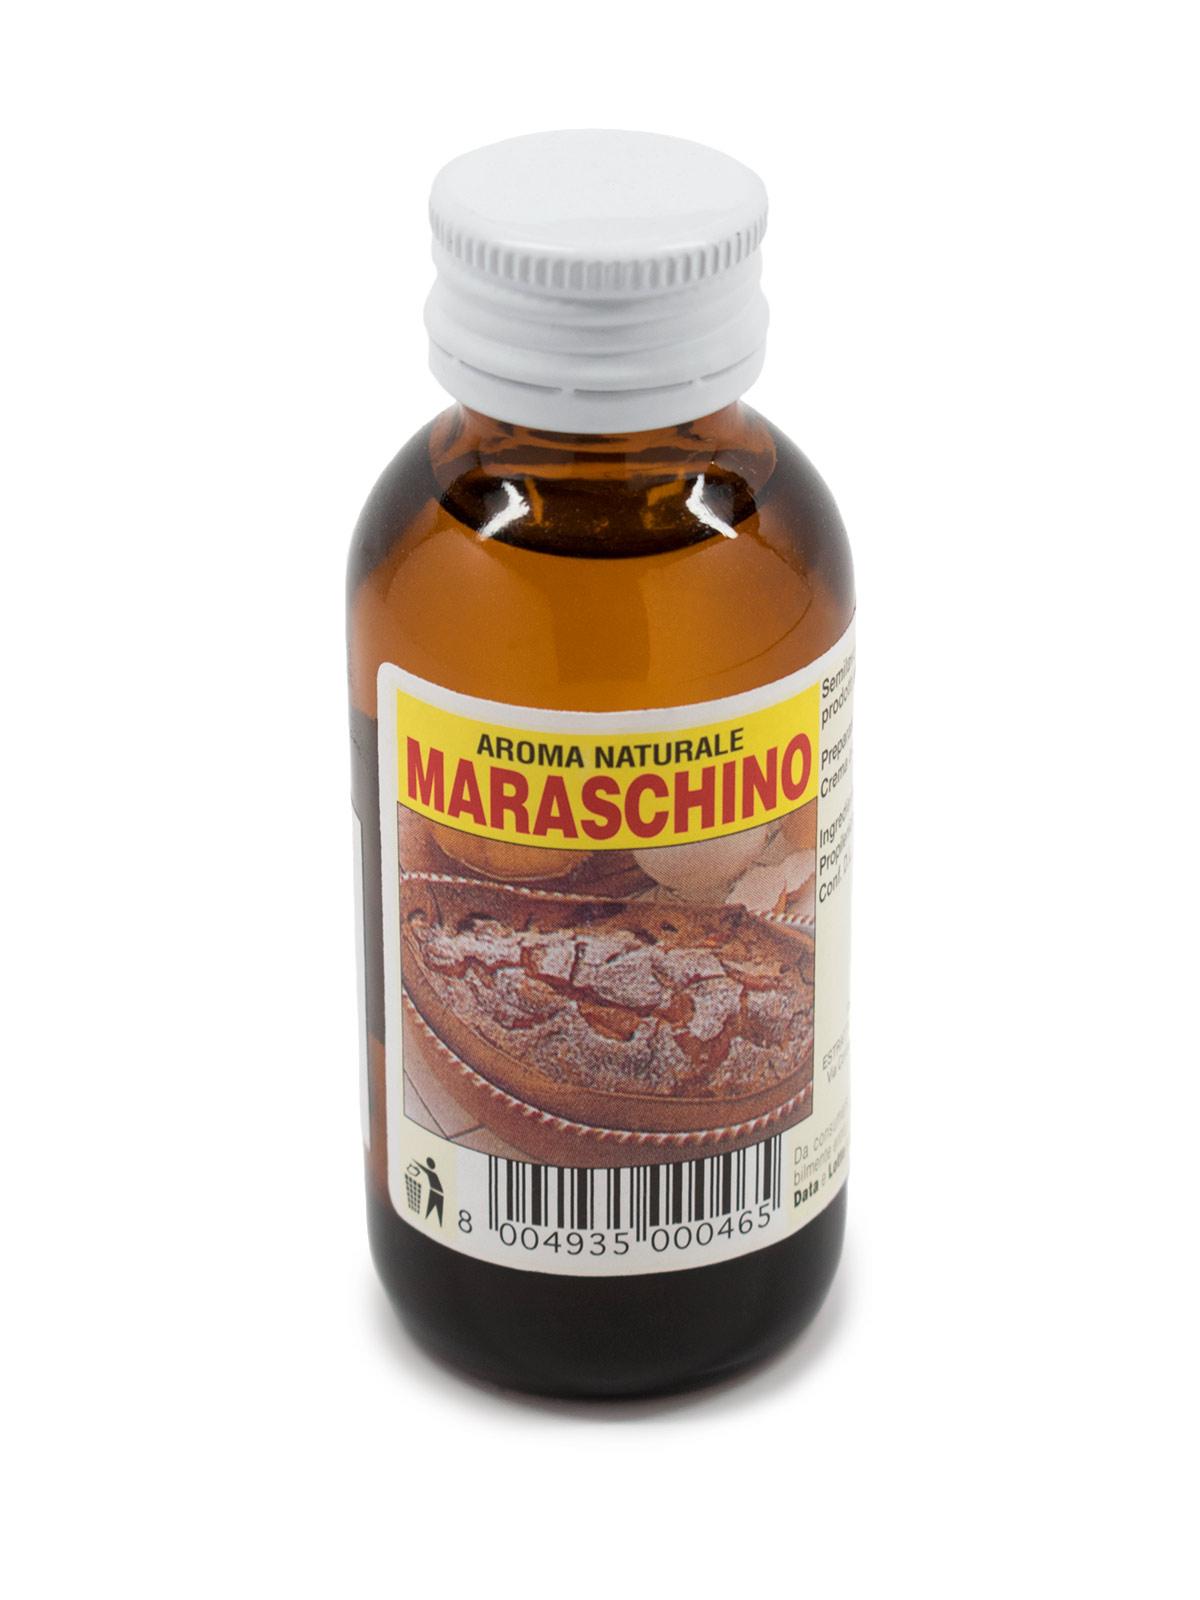 Maraschino Flavoring - Baking Essentials - Buon'Italia